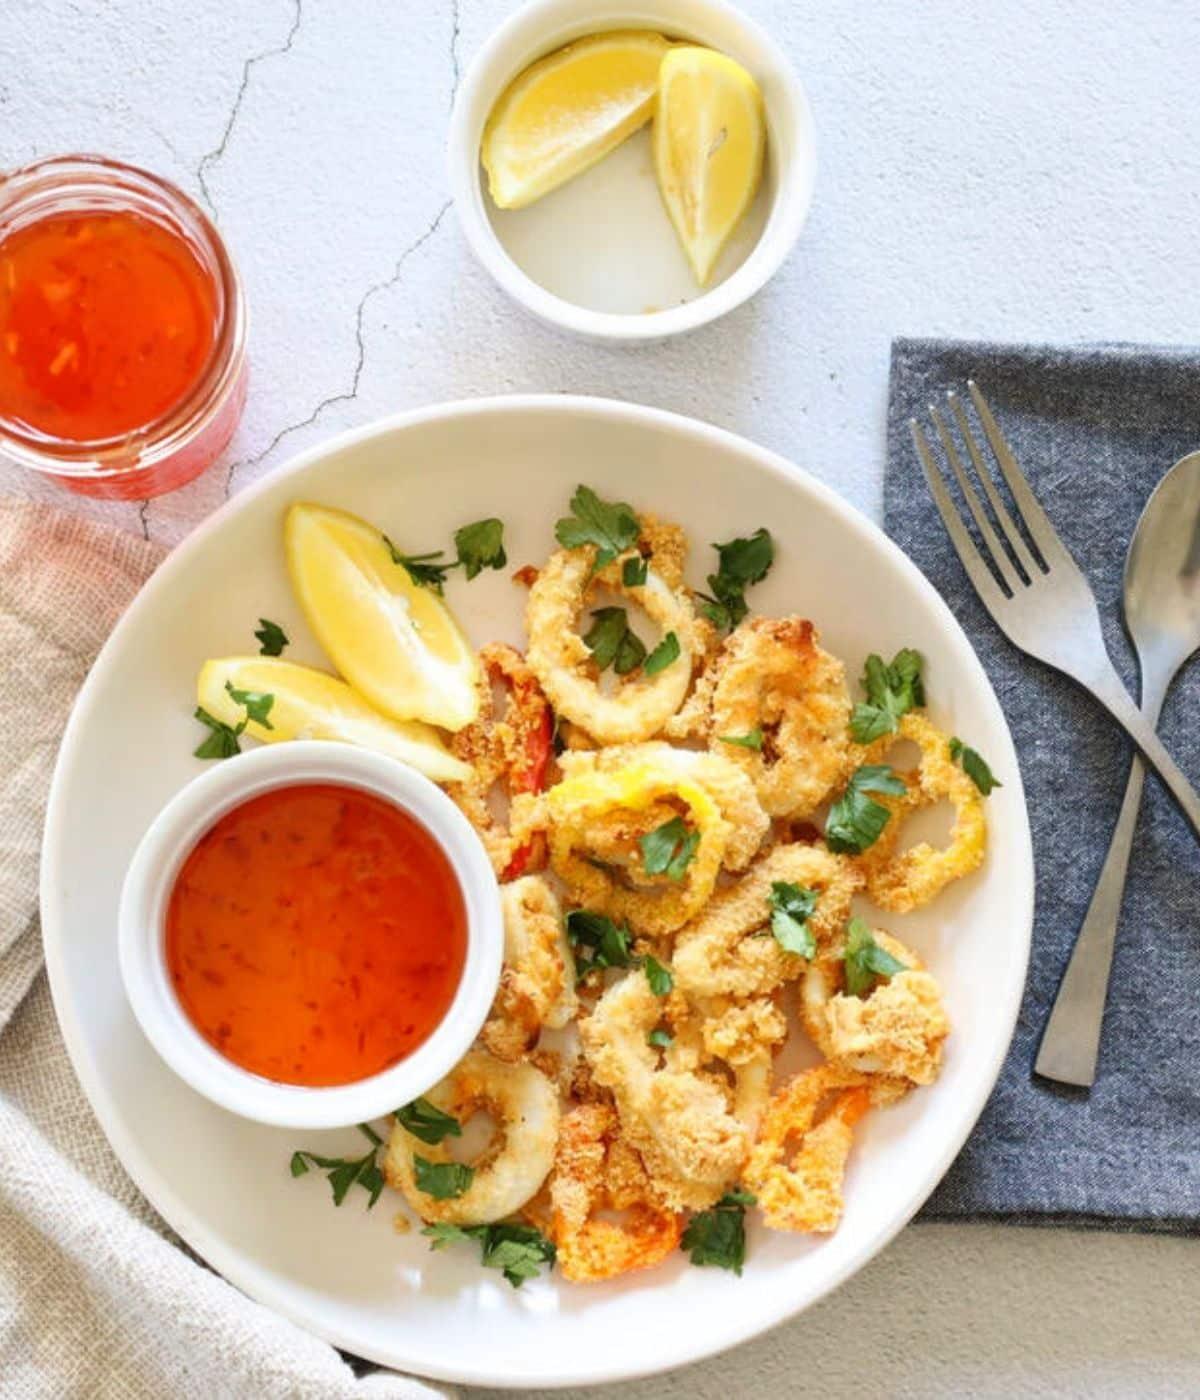 calamari with peppers lemon and sweet chili sauce